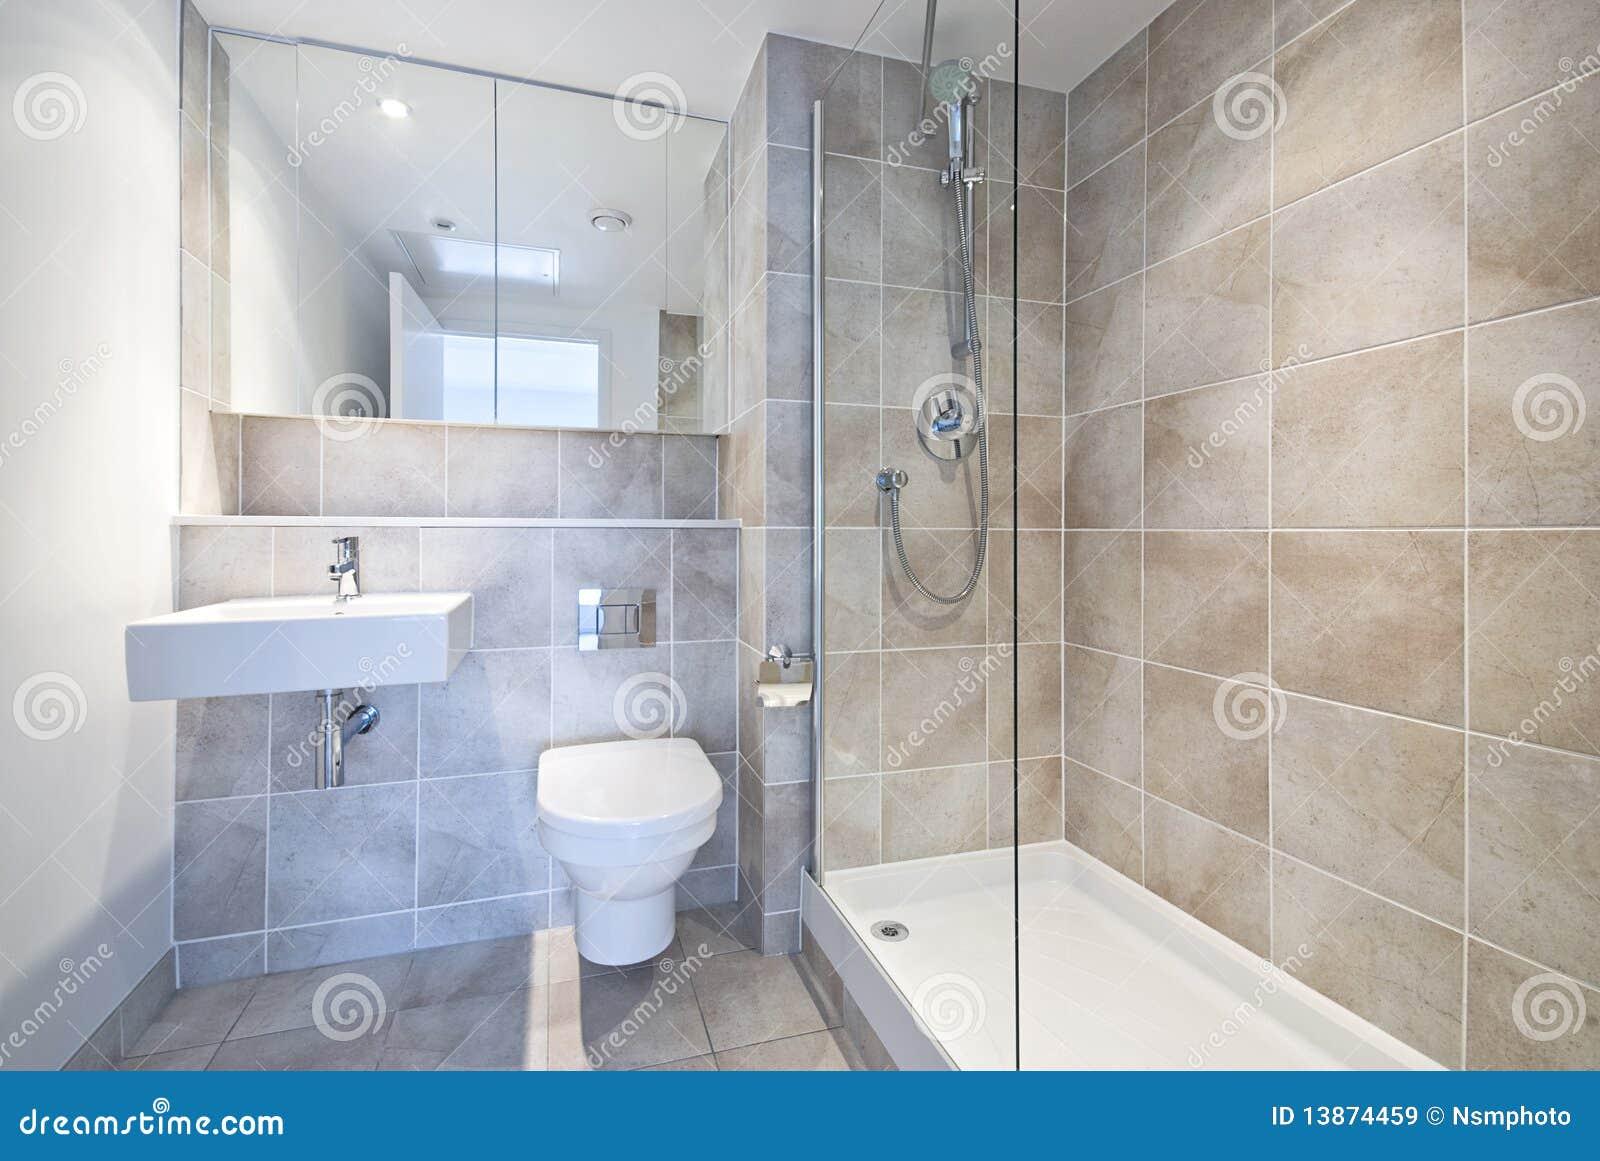 Grande salle de bain contemporaine: transparence et clarte le ...